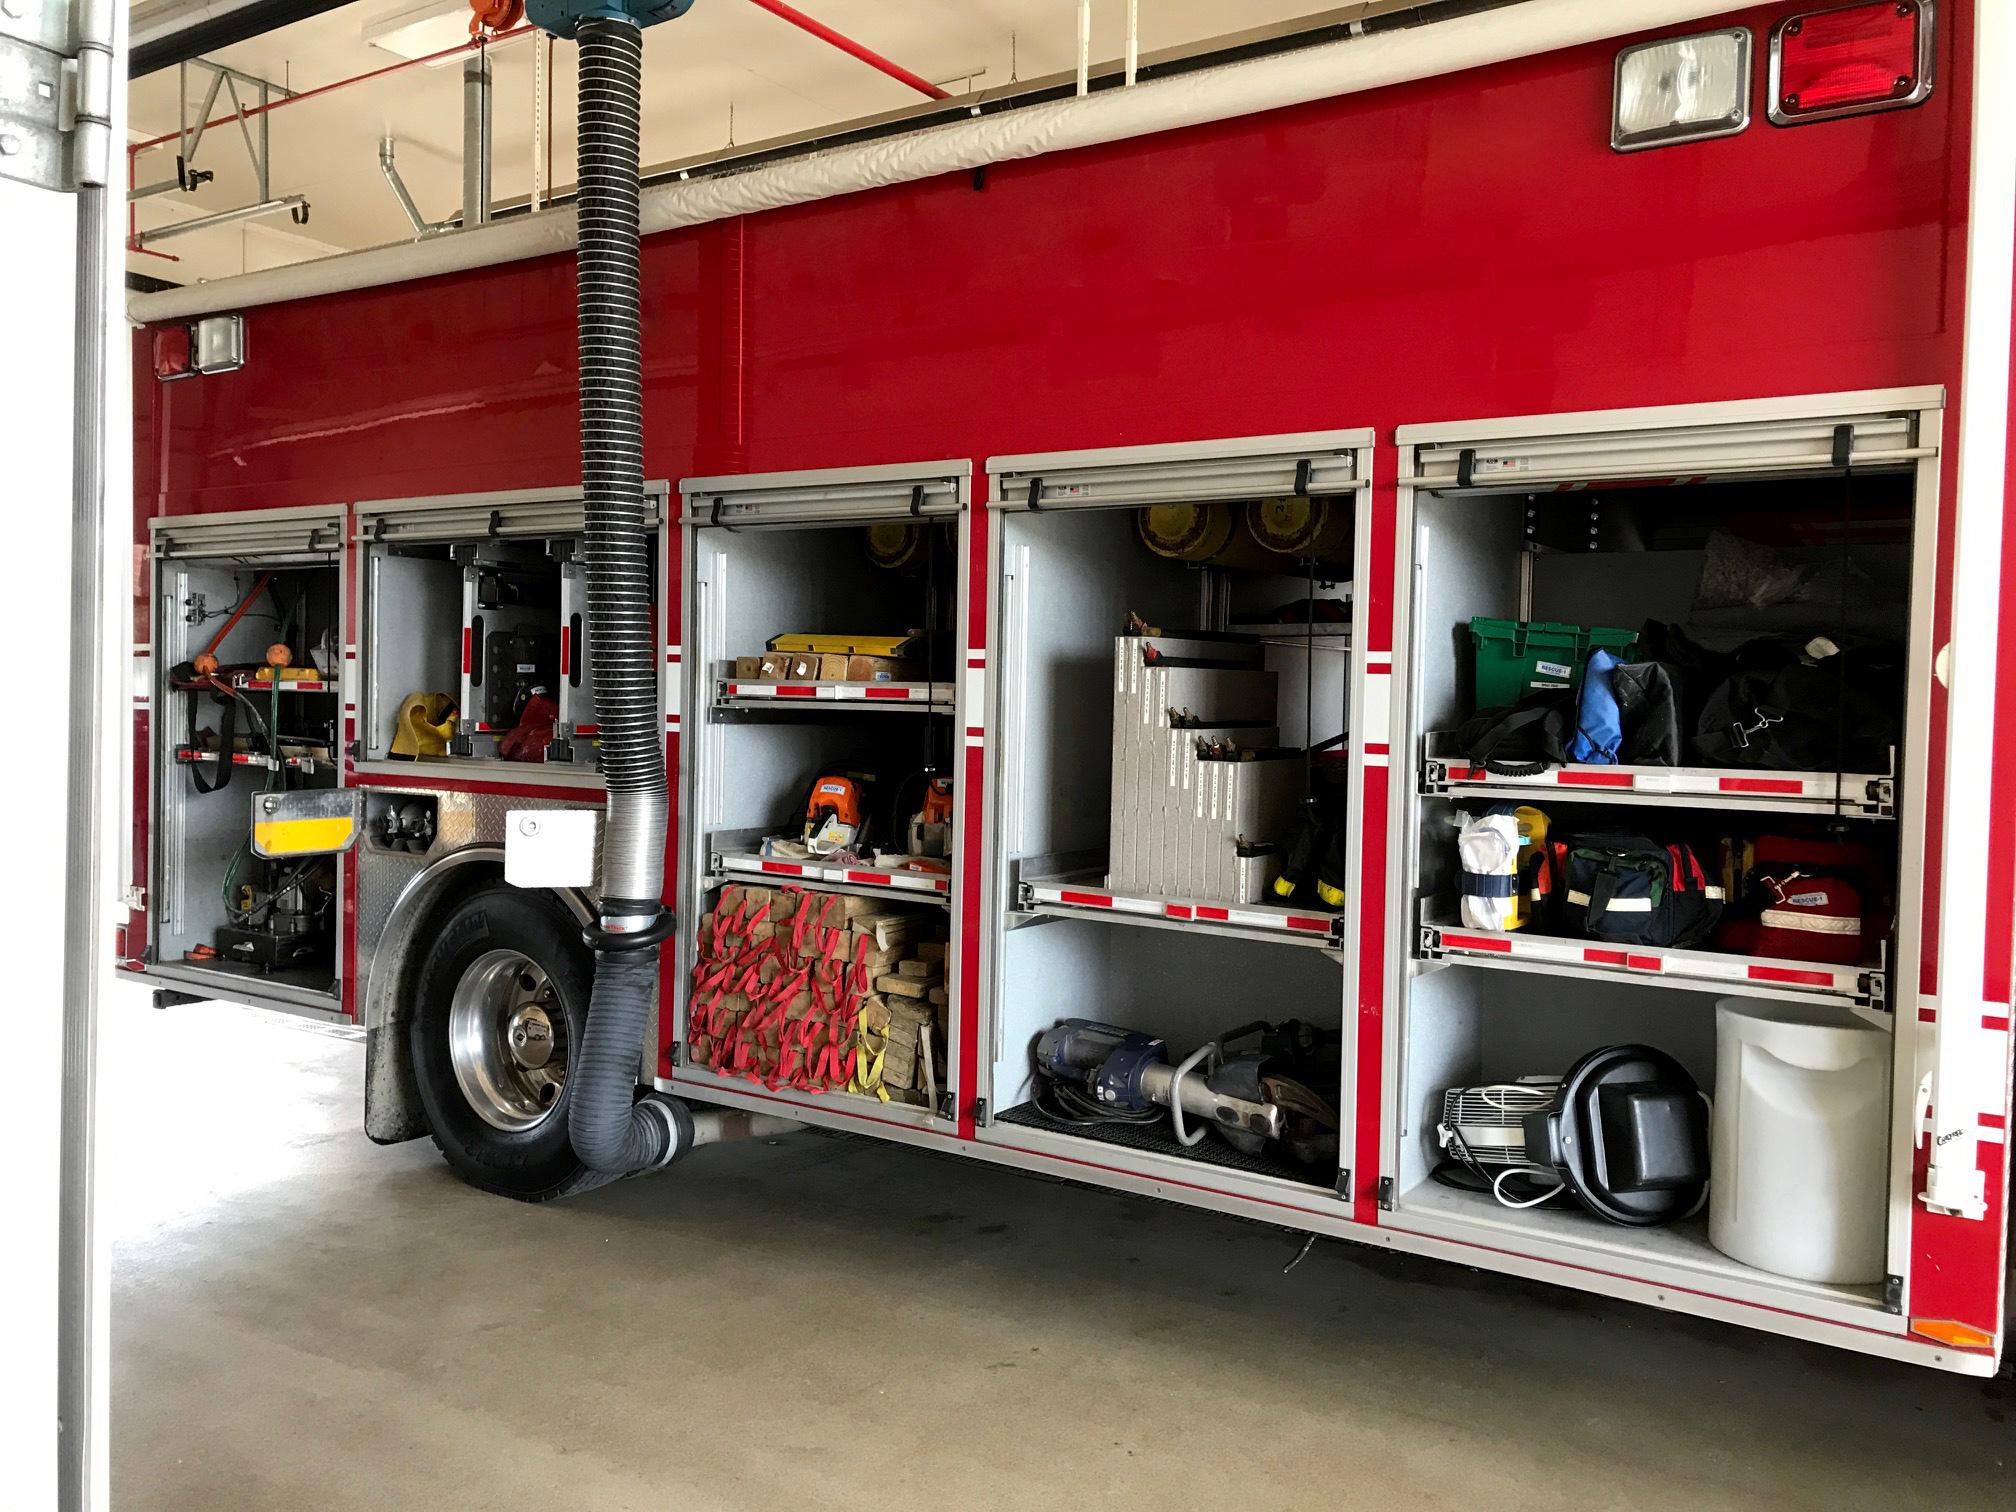 2009 Spartan MetroStar Heavy Rescue | Used Truck Details